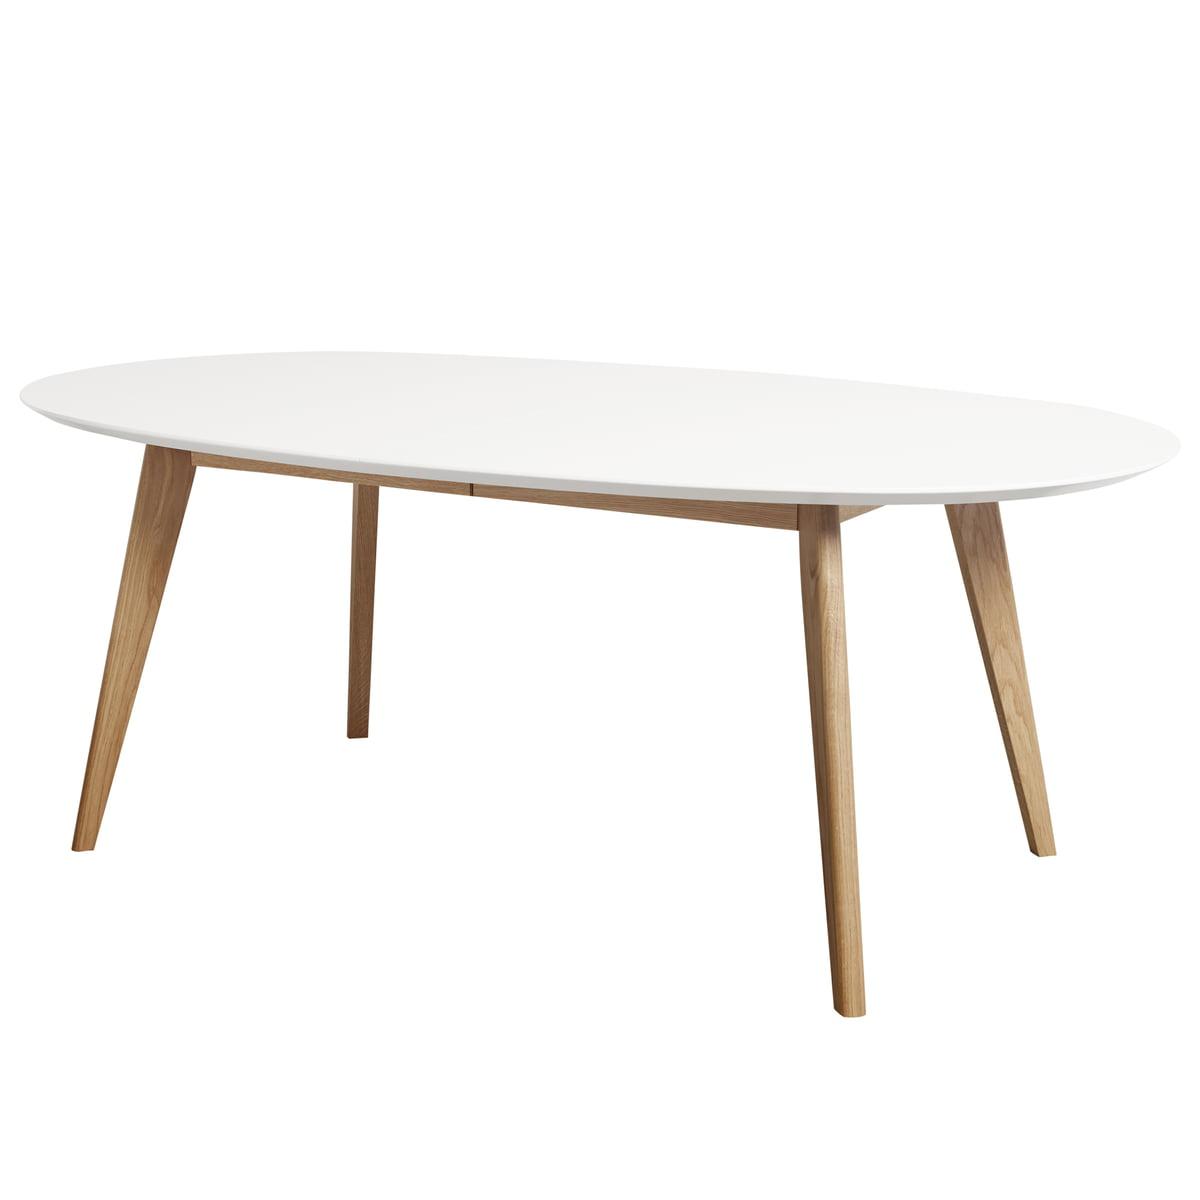 dk10 dining table wood by andersen furniture. Black Bedroom Furniture Sets. Home Design Ideas